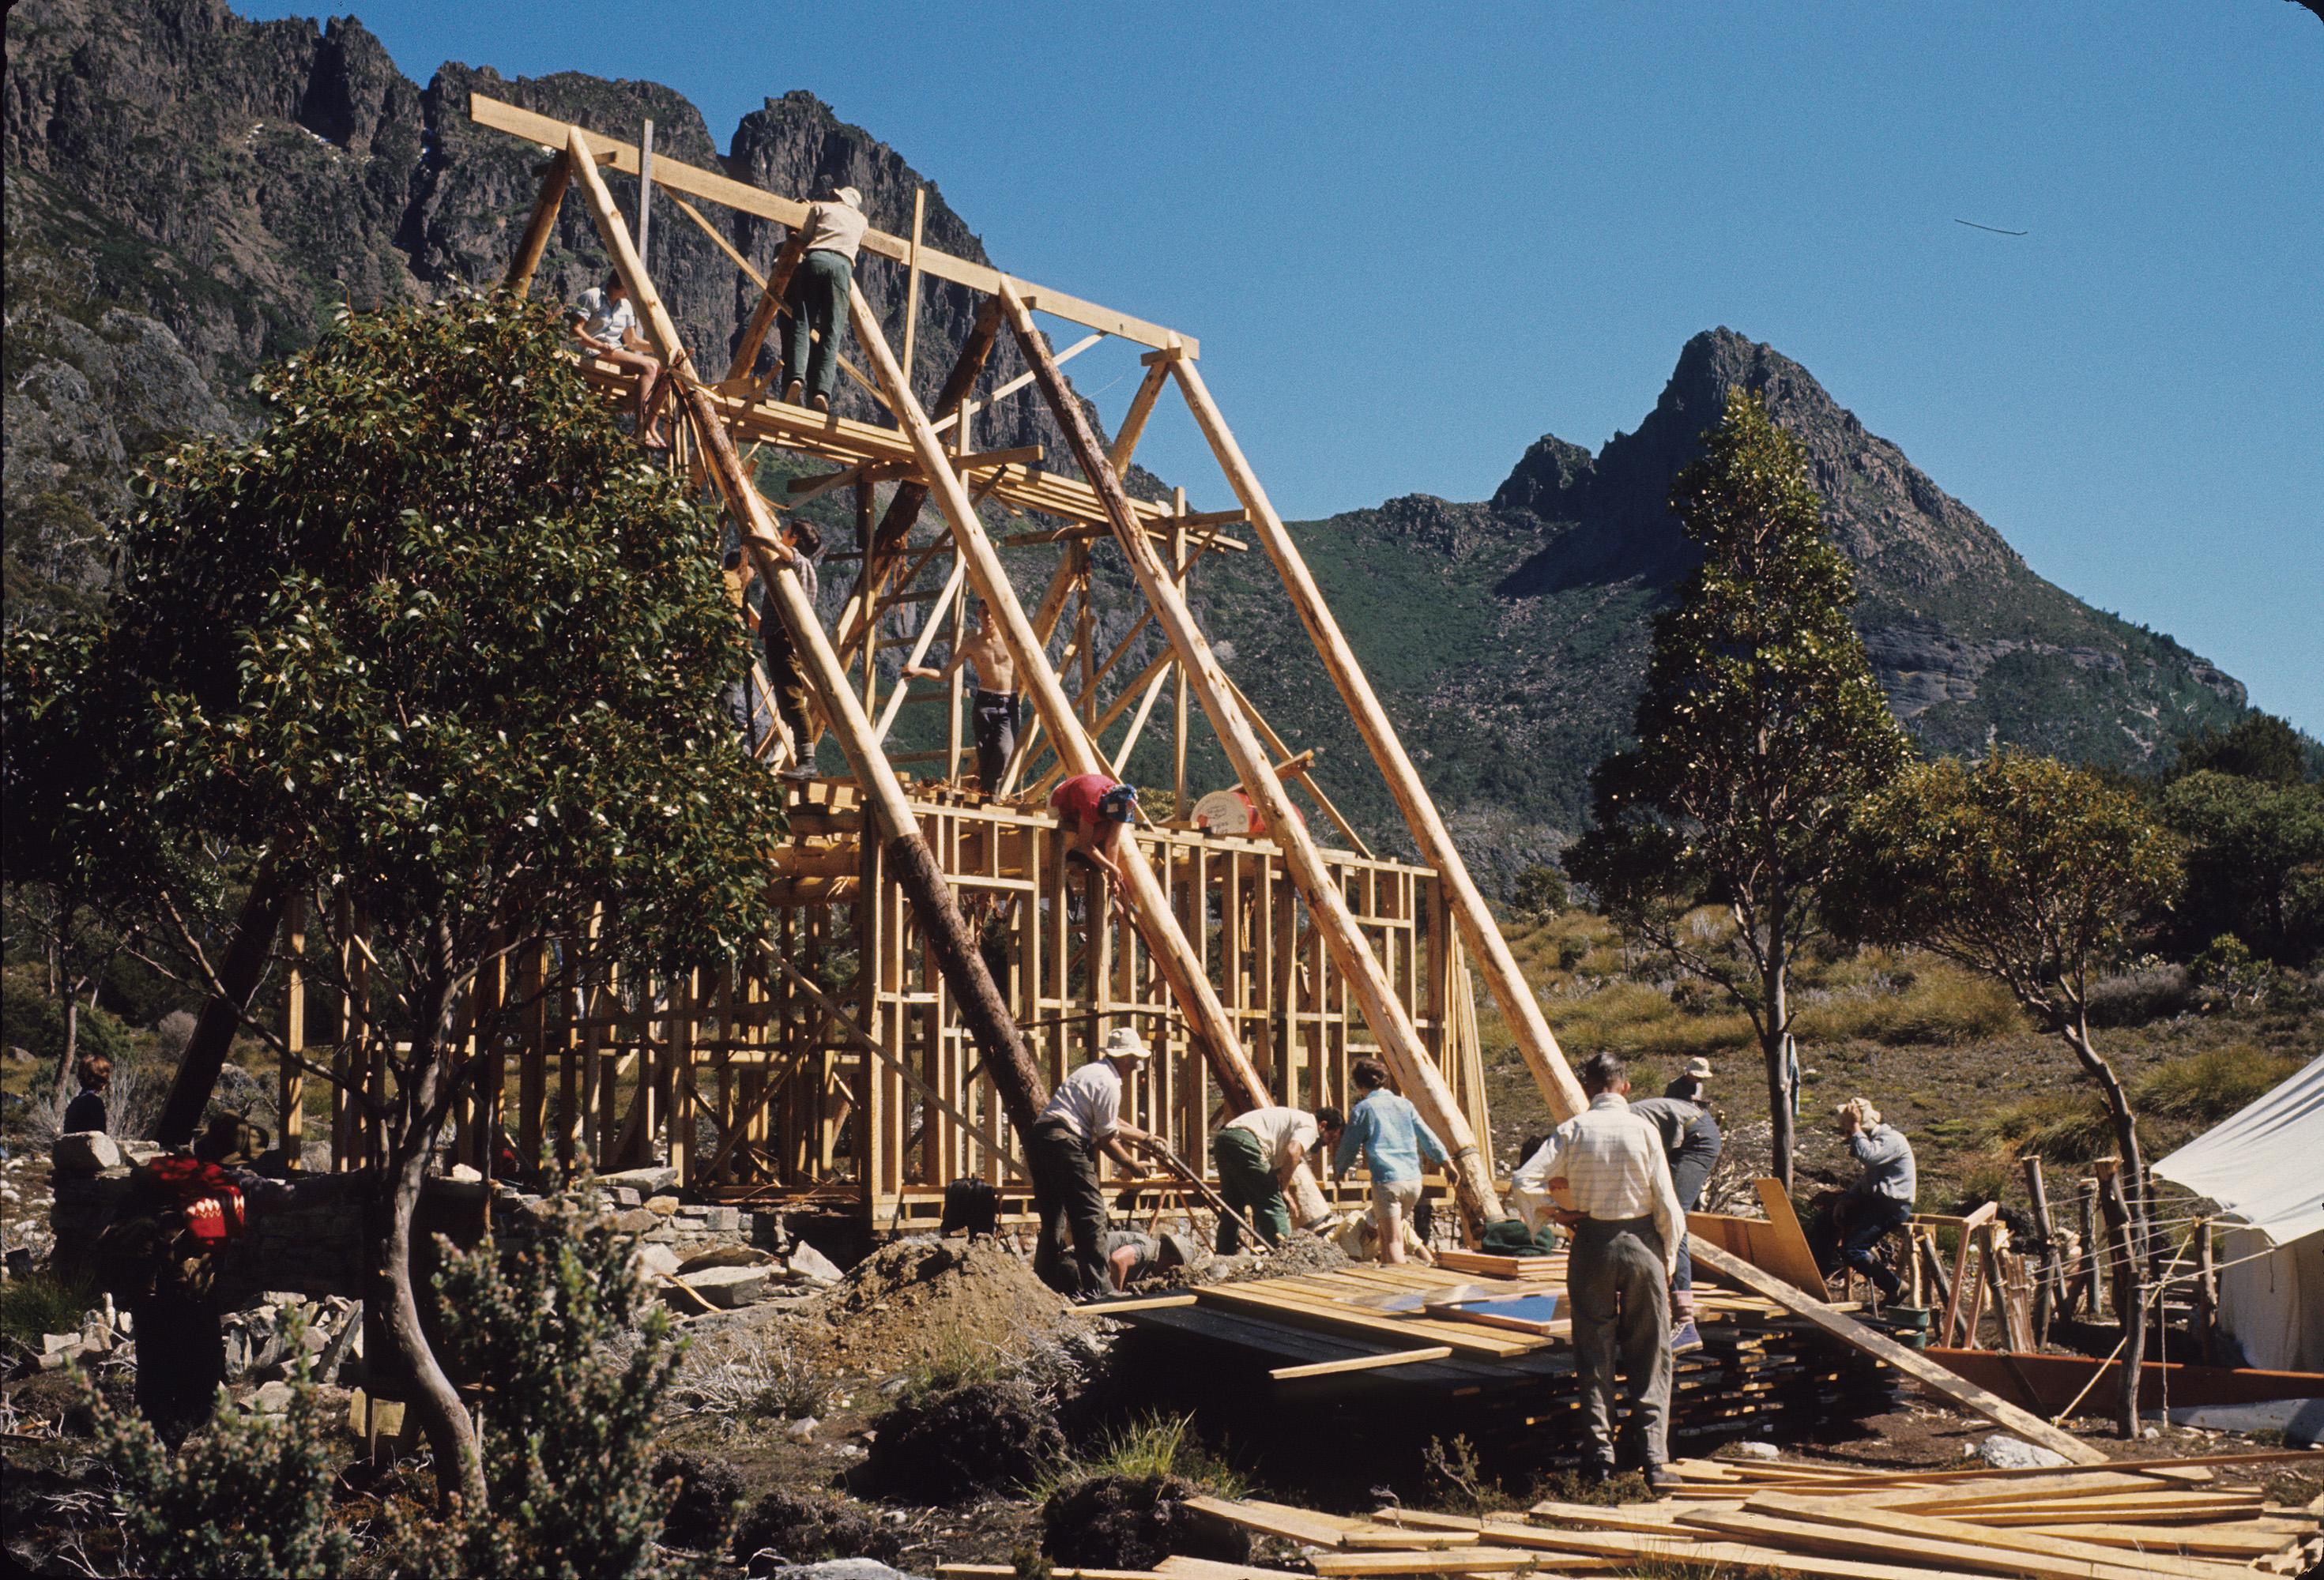 Scott Kilvert Memorial Hut